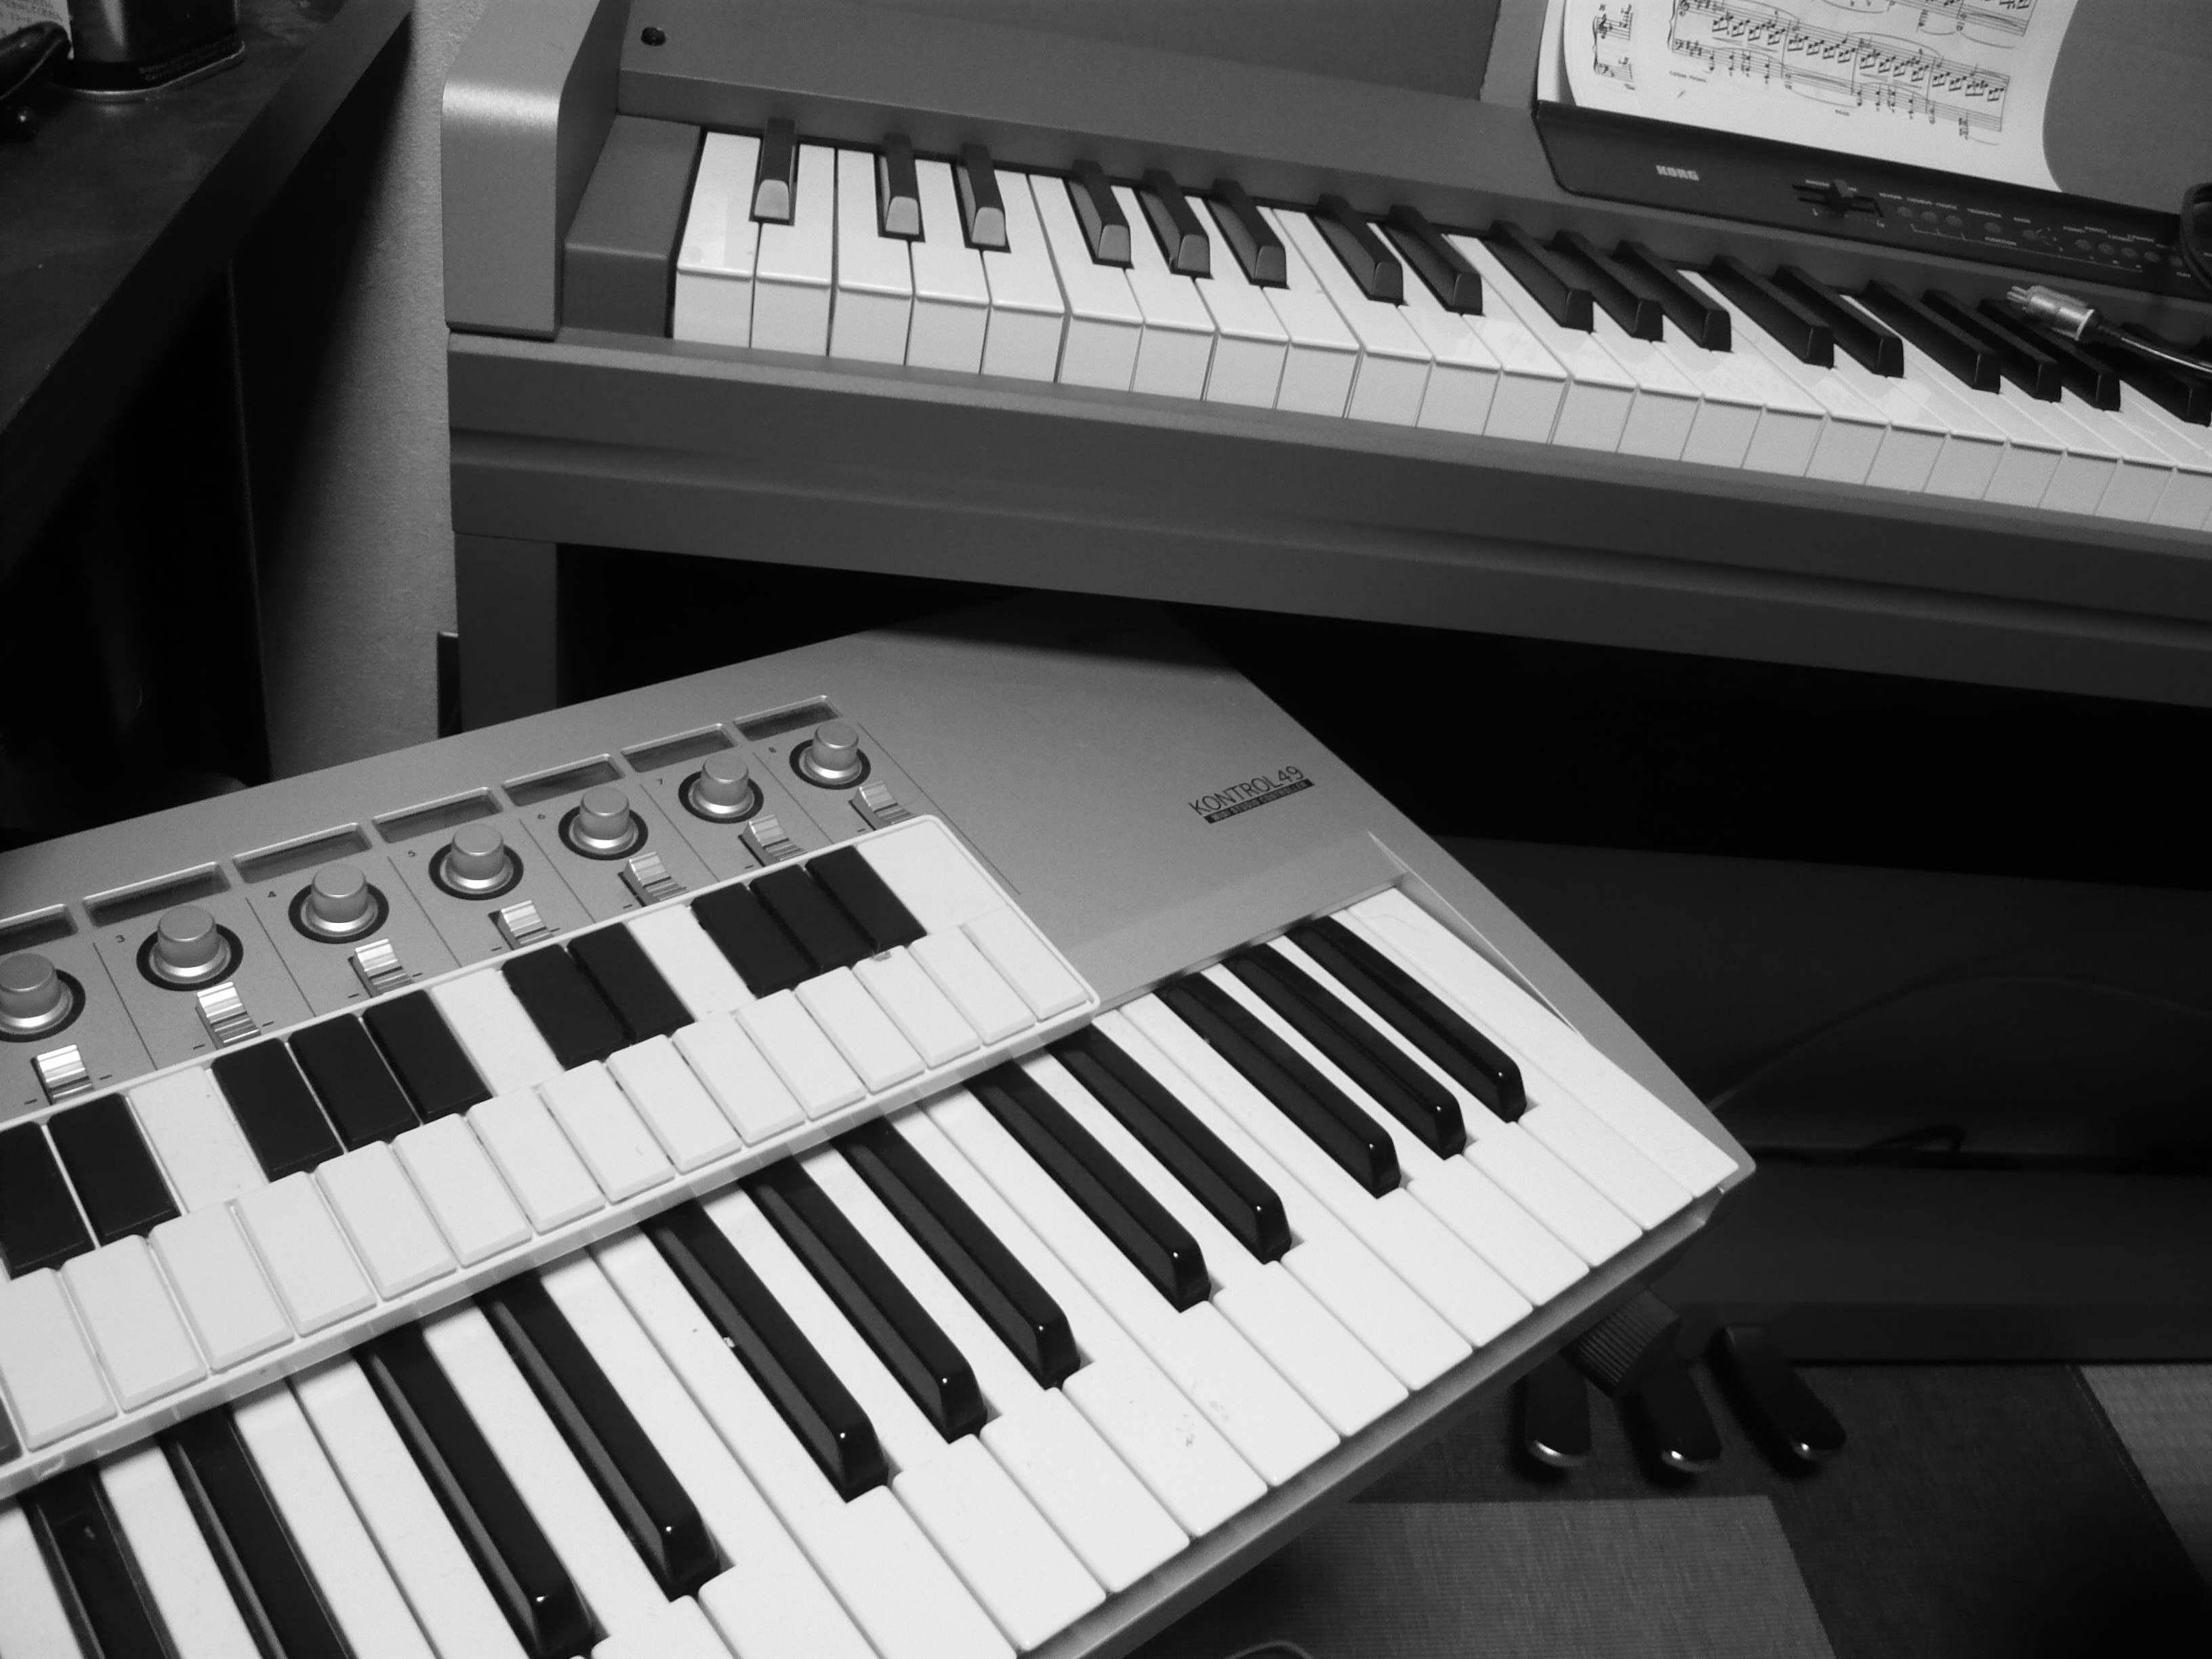 file korg keyboards nanokey kontrol 49 and lp350 digital piano taken with old compact. Black Bedroom Furniture Sets. Home Design Ideas